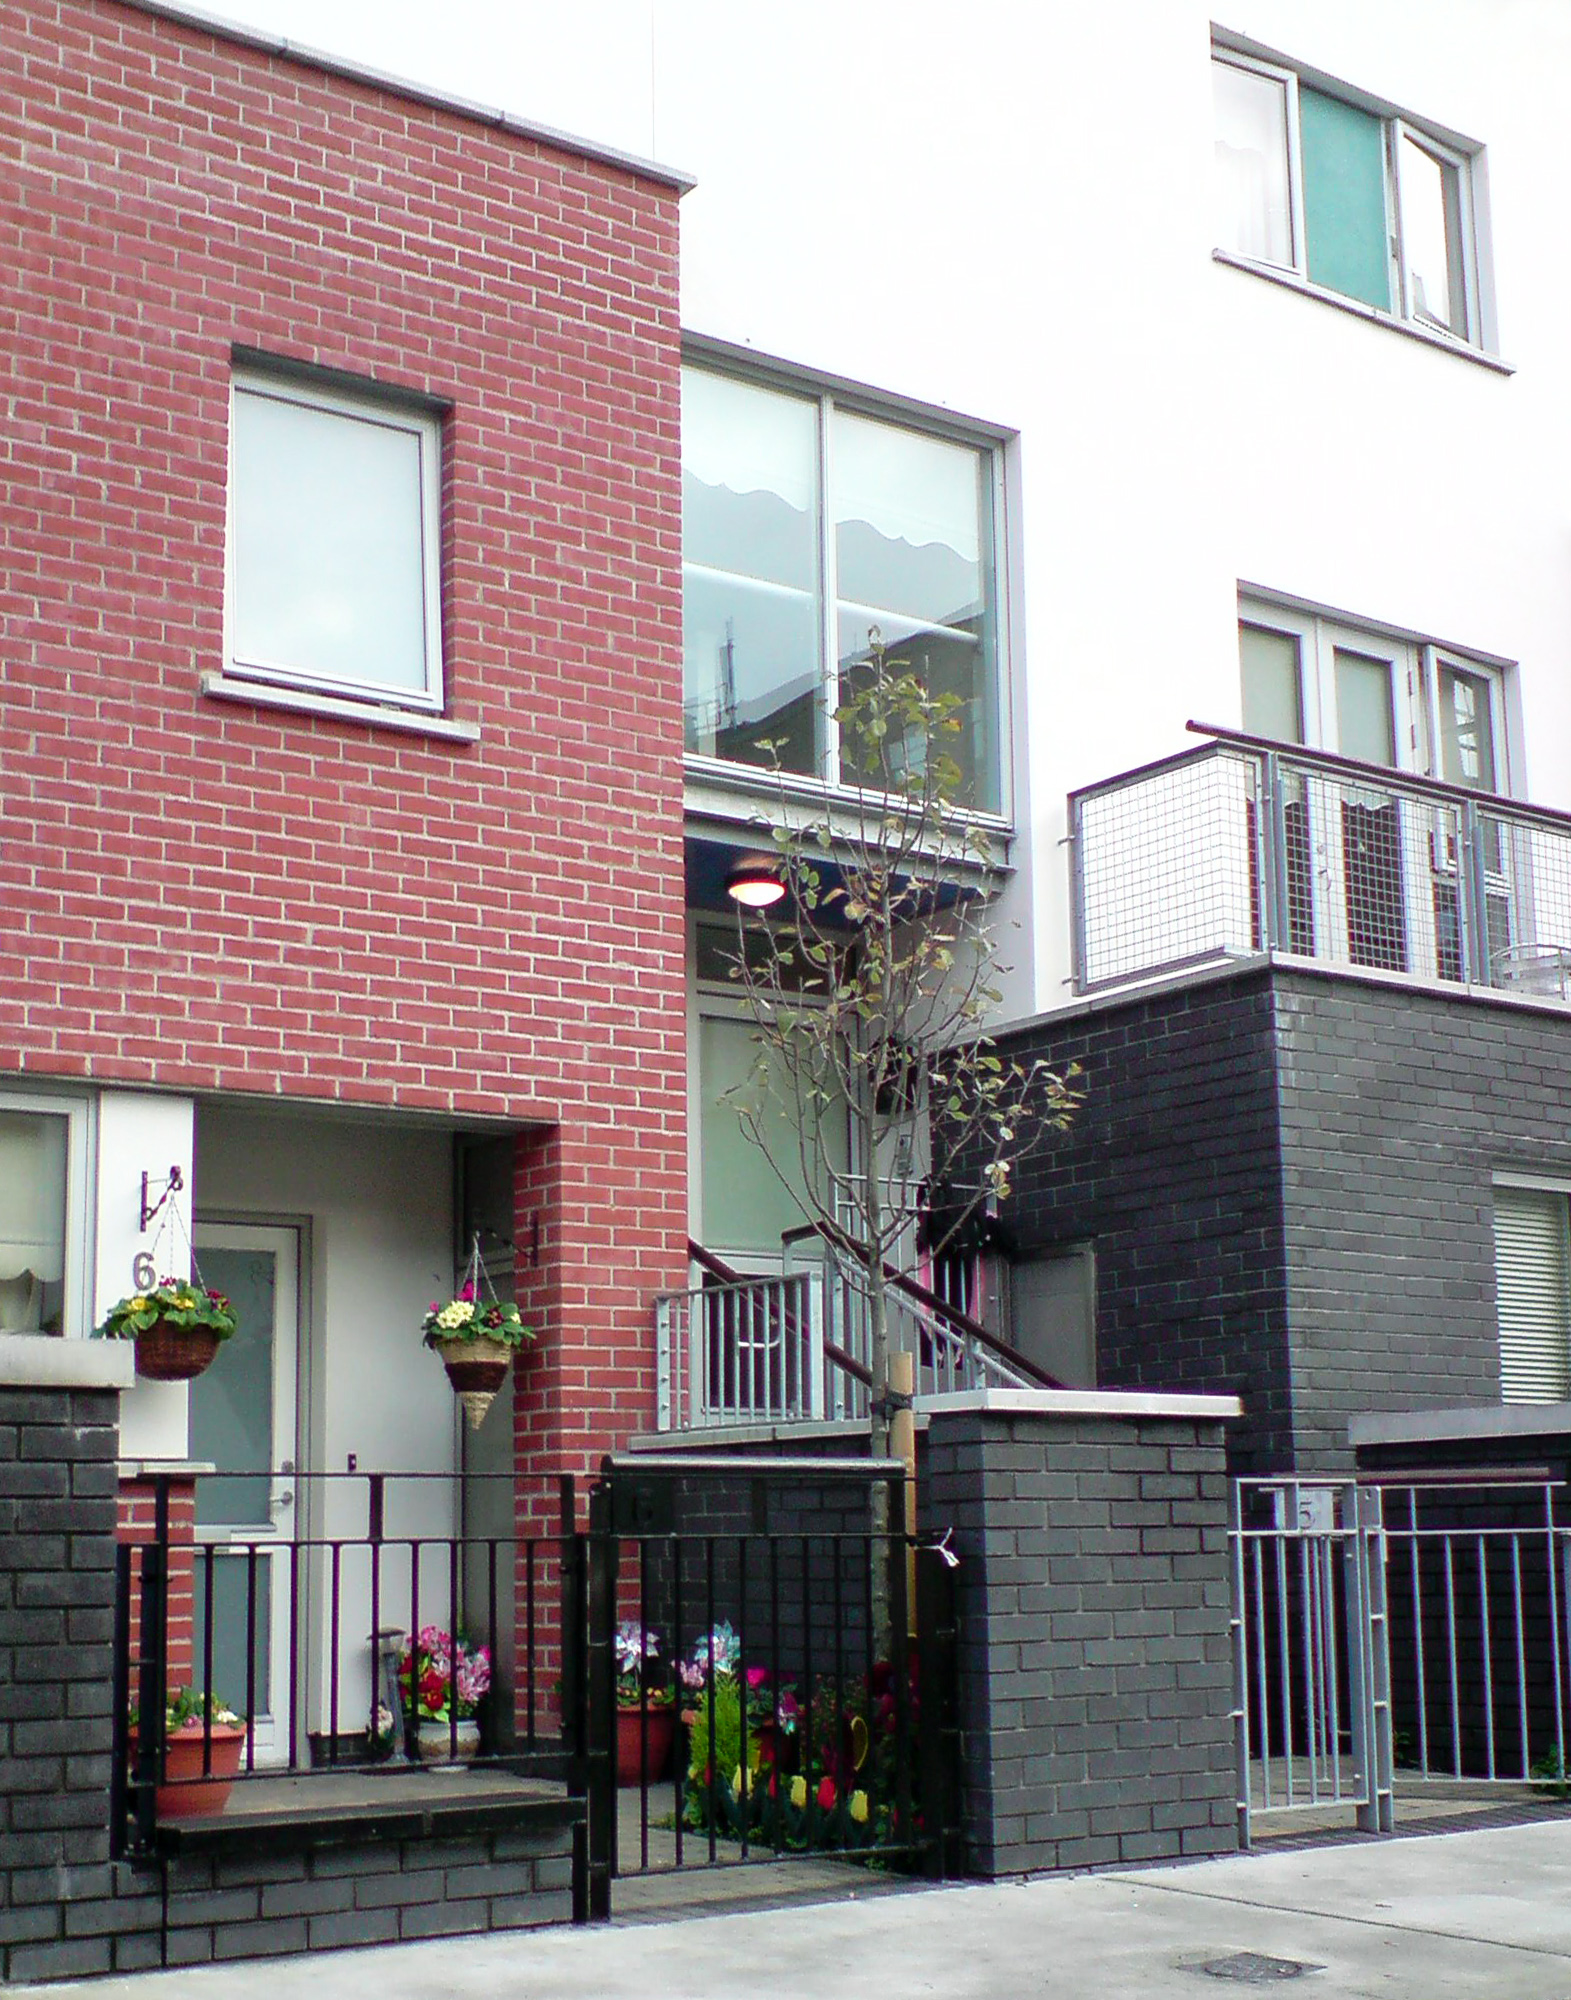 Infill_Housing_Planting_Residents.JPG